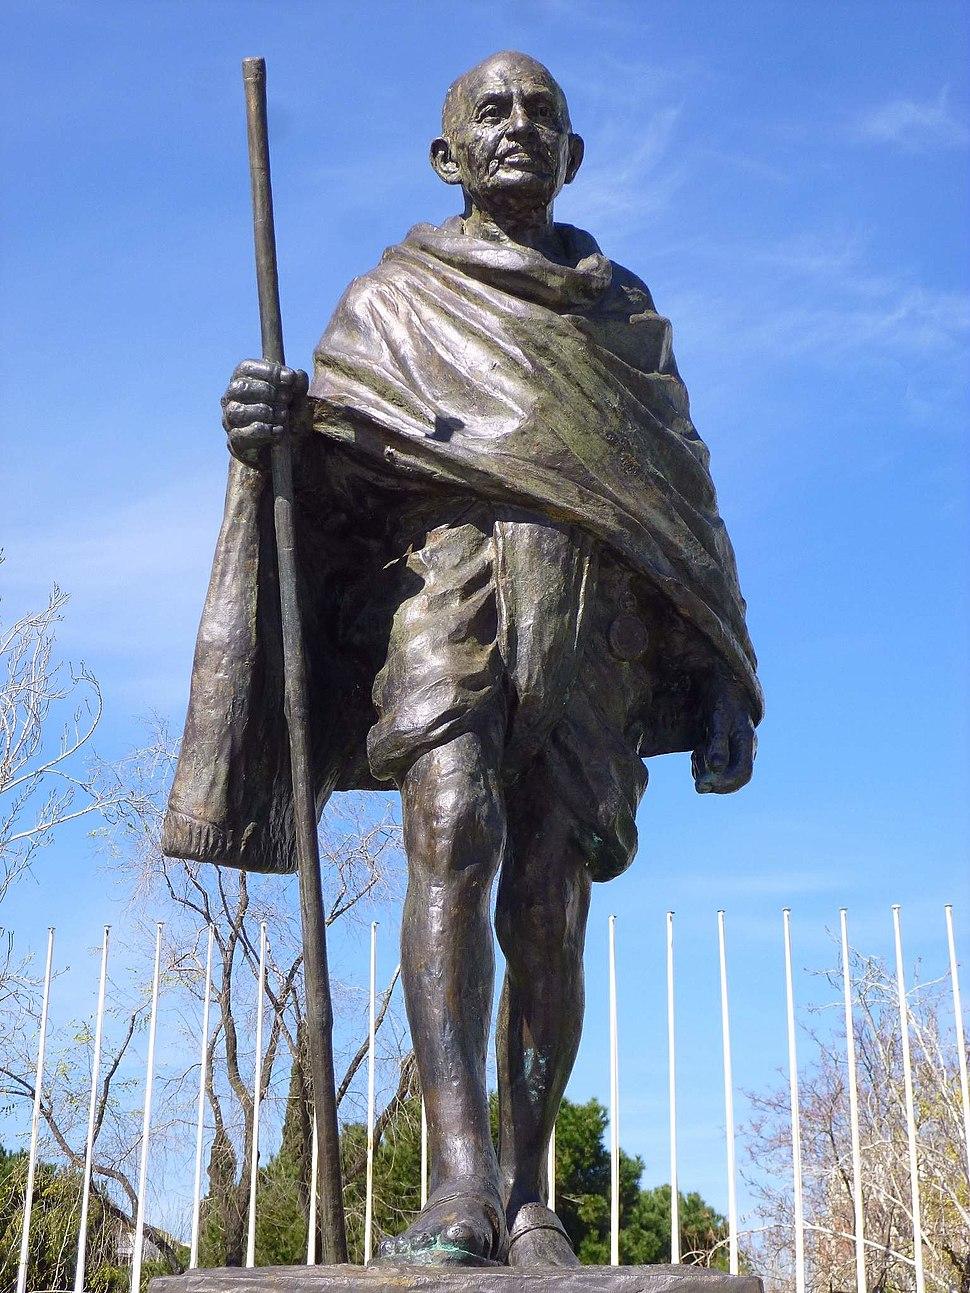 Madrid - Plaza Joan Miró, Monumento a Mohandas K. Gandhi 2